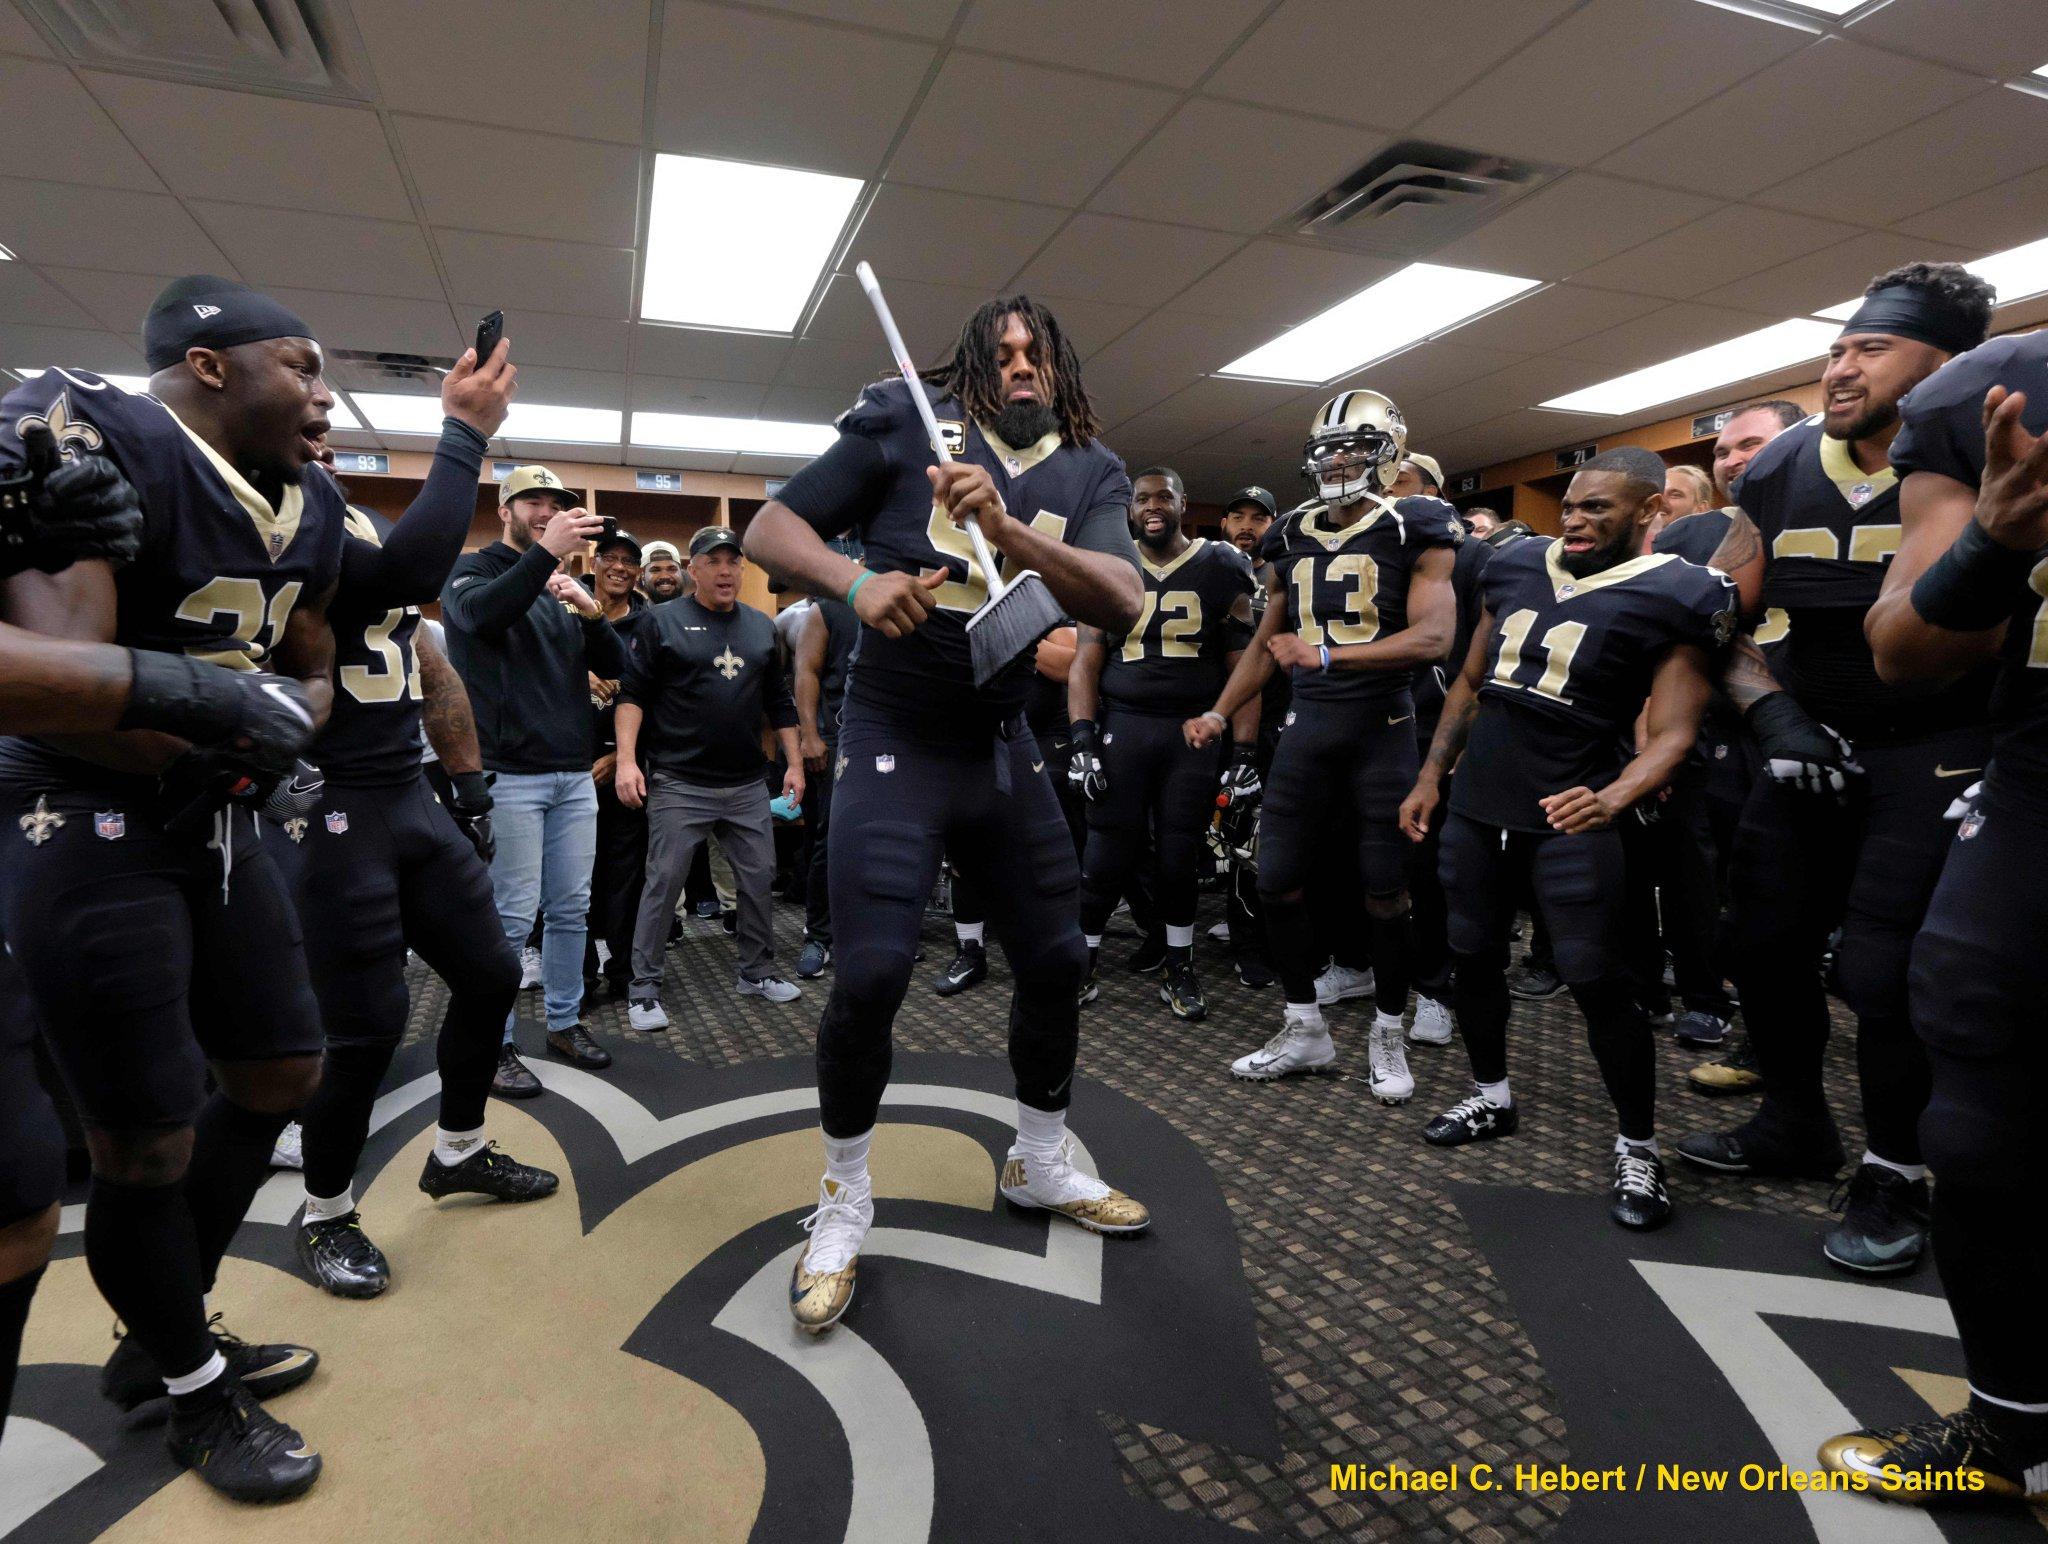 The #Saints locker room was LIT ��after yesterday's win!  PHOTOS: https://t.co/V3uFMjwNBz  #GoSaints #LoveTheSaints https://t.co/VcTeK23XG7